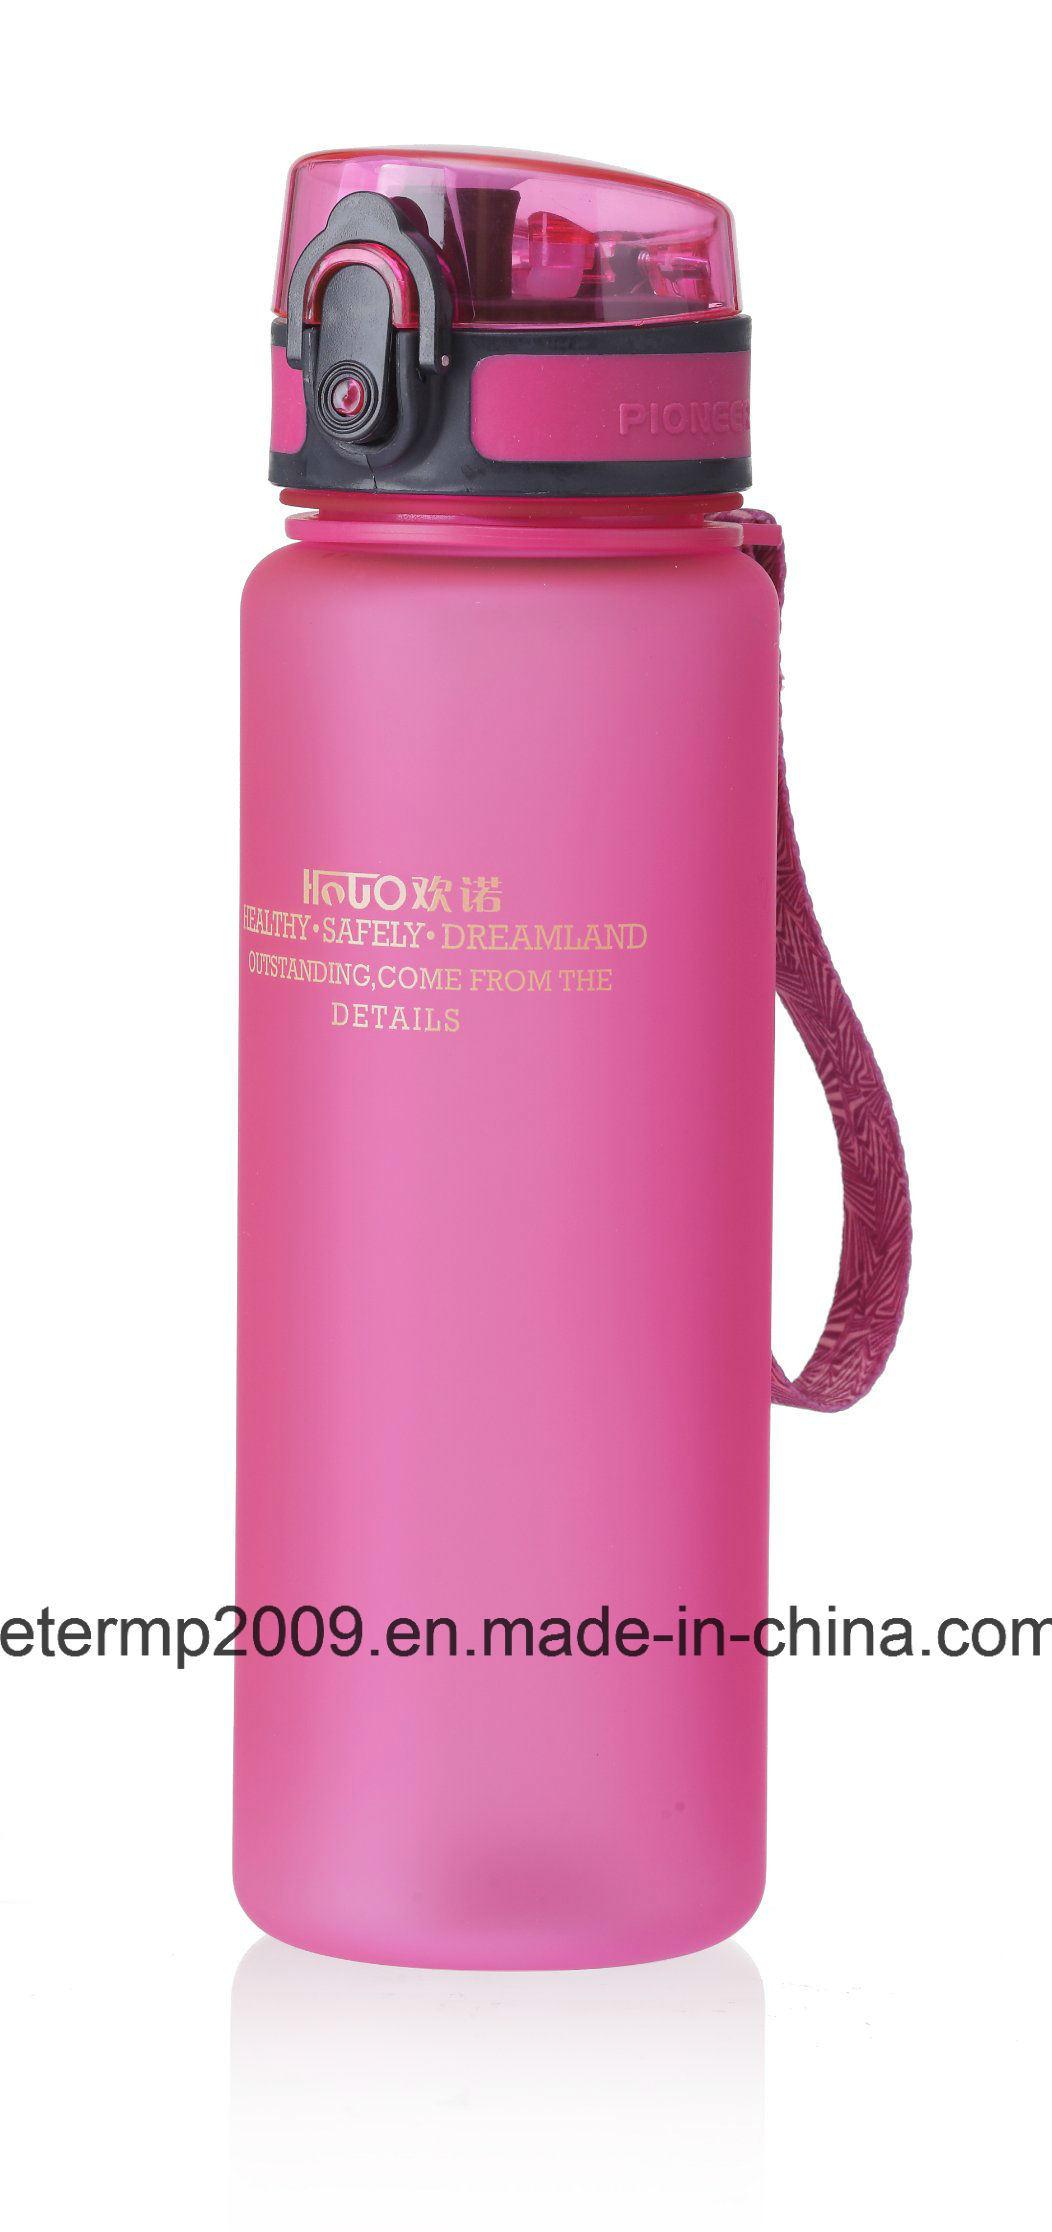 600ml 20oz Plastic Water Bottle, Gray Sport Bottle, Customized Color and Design Bottle